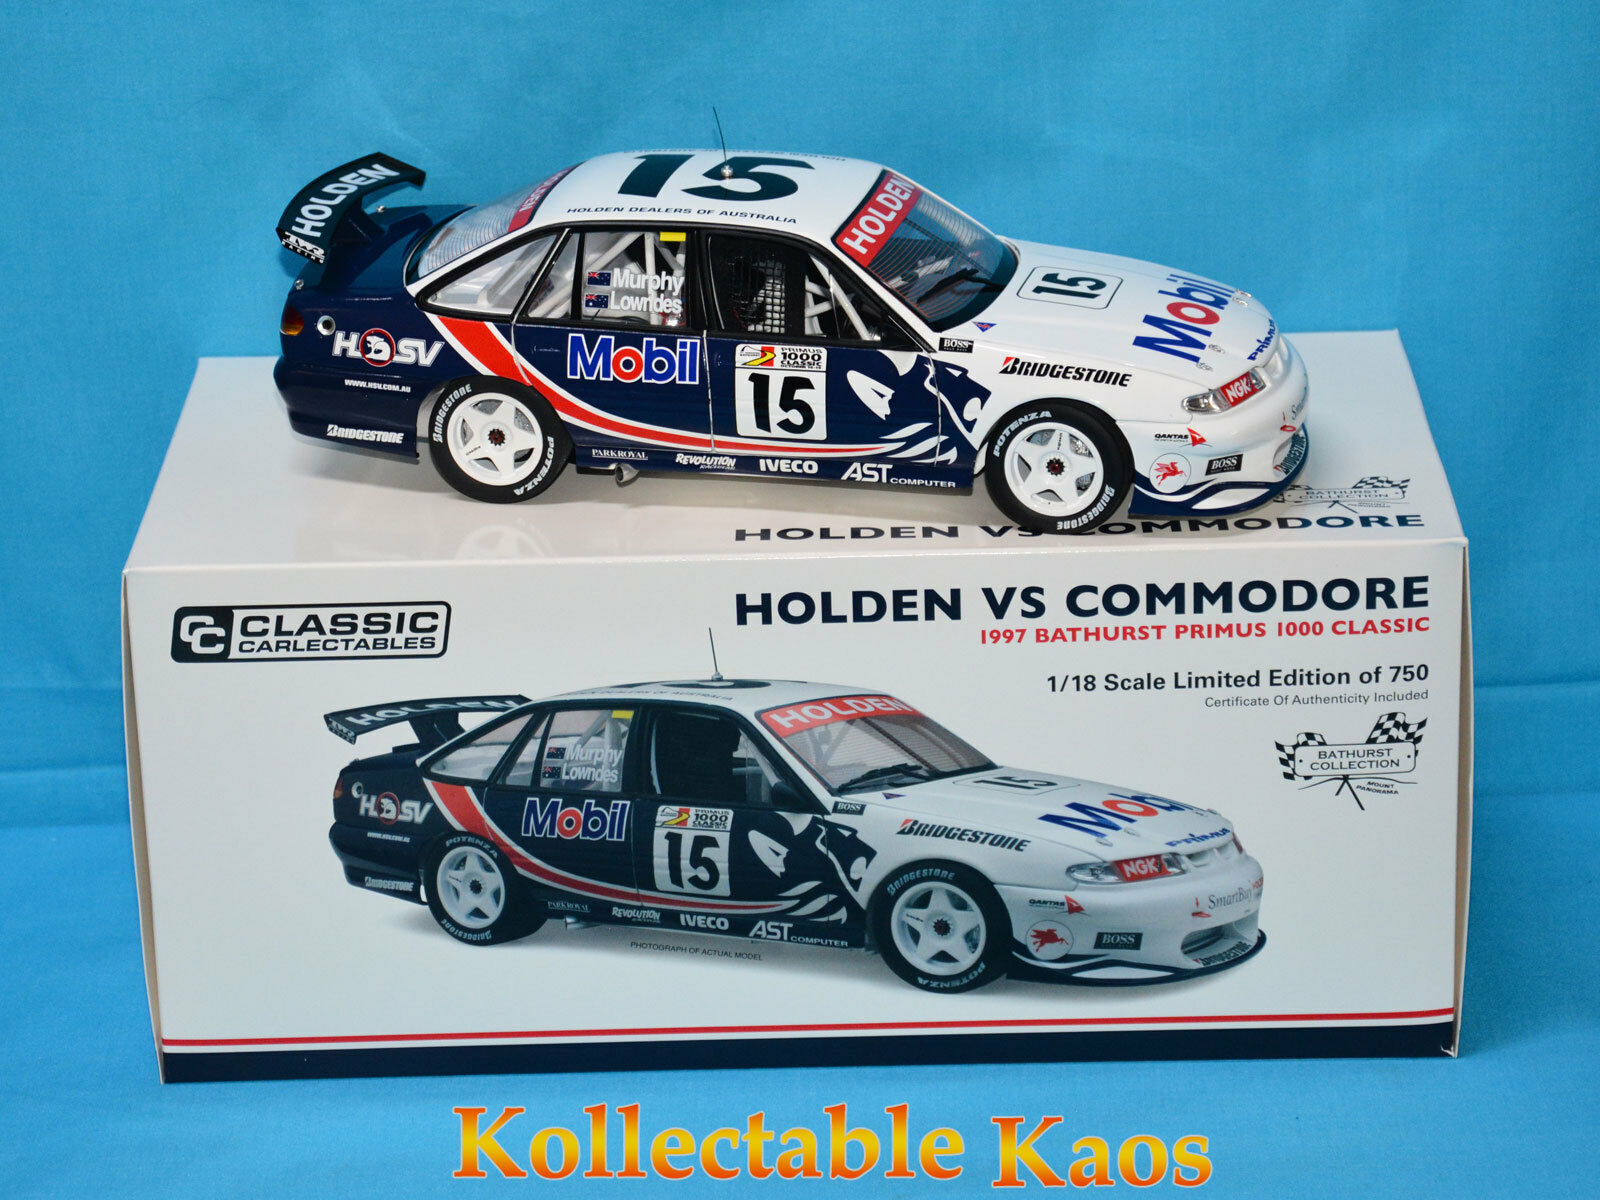 1 18 Classics - 1997 Bathurst Primus 1000 Classic - Holden VS - Murphy Lowndes